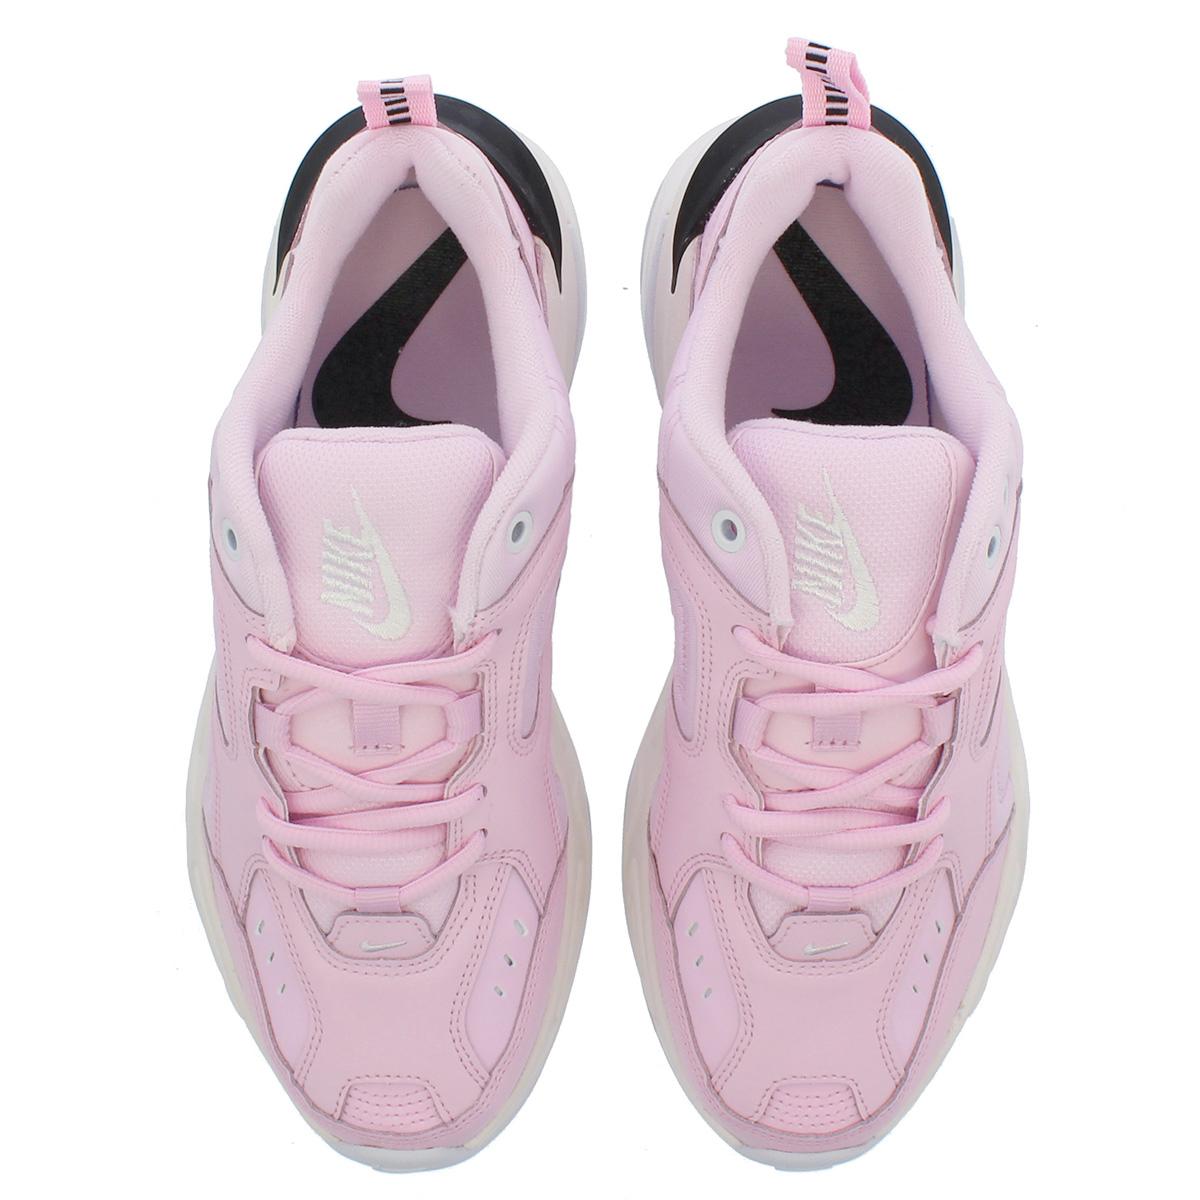 6f64ce17210 NIKE WMNS M2K TEKNO Nike women M2K techno PINK FOAM BLACK PHANTOM WHITE  ao3108-600